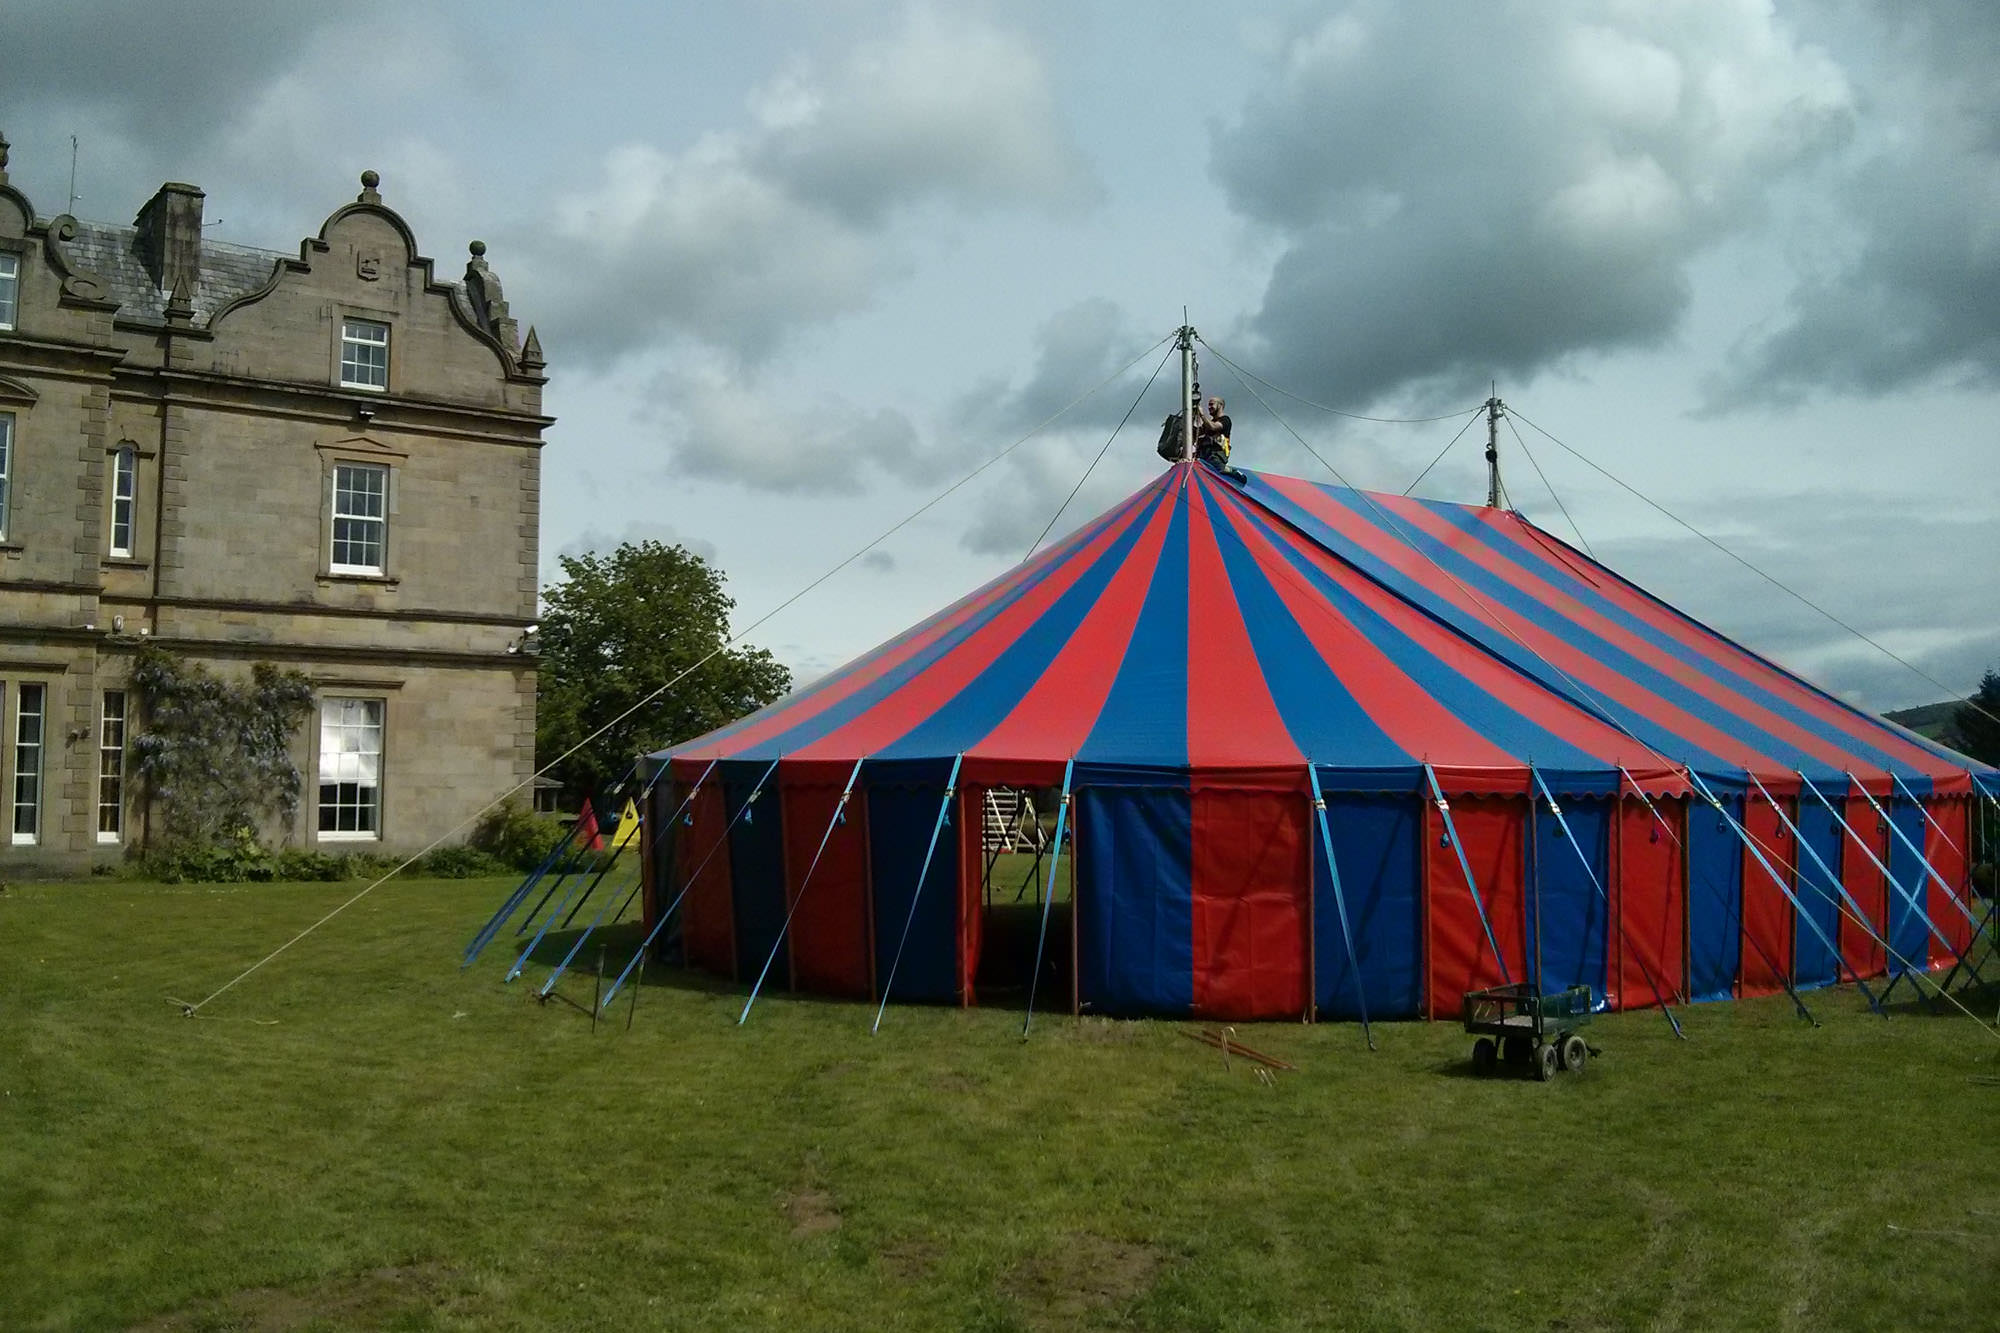 Big Top Weddings - Unique, Alterntaive Circus tent hire